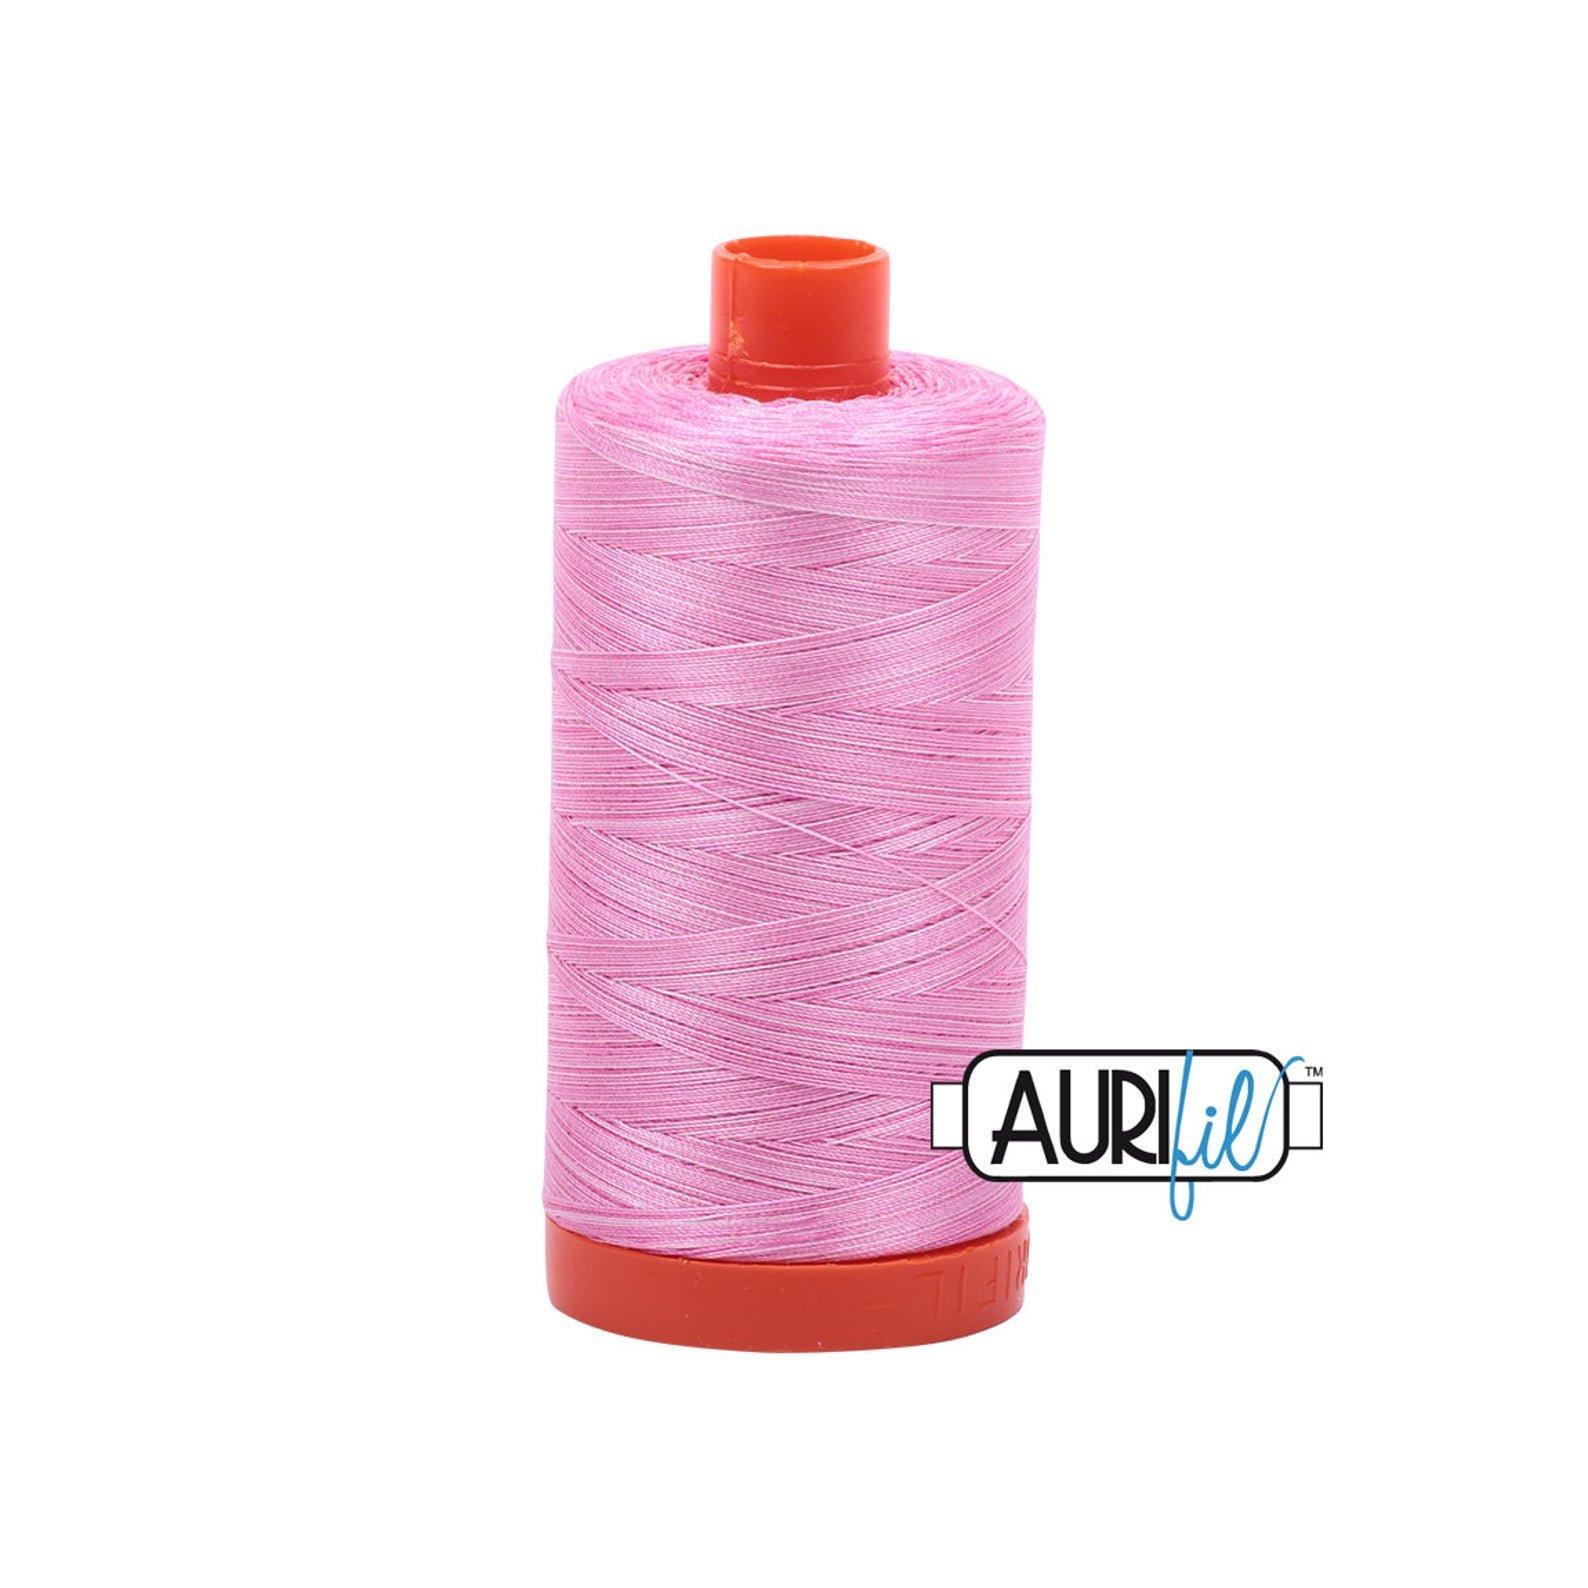 Mako Cotton Embroidery Thread 12wt 356yds Bubblegum